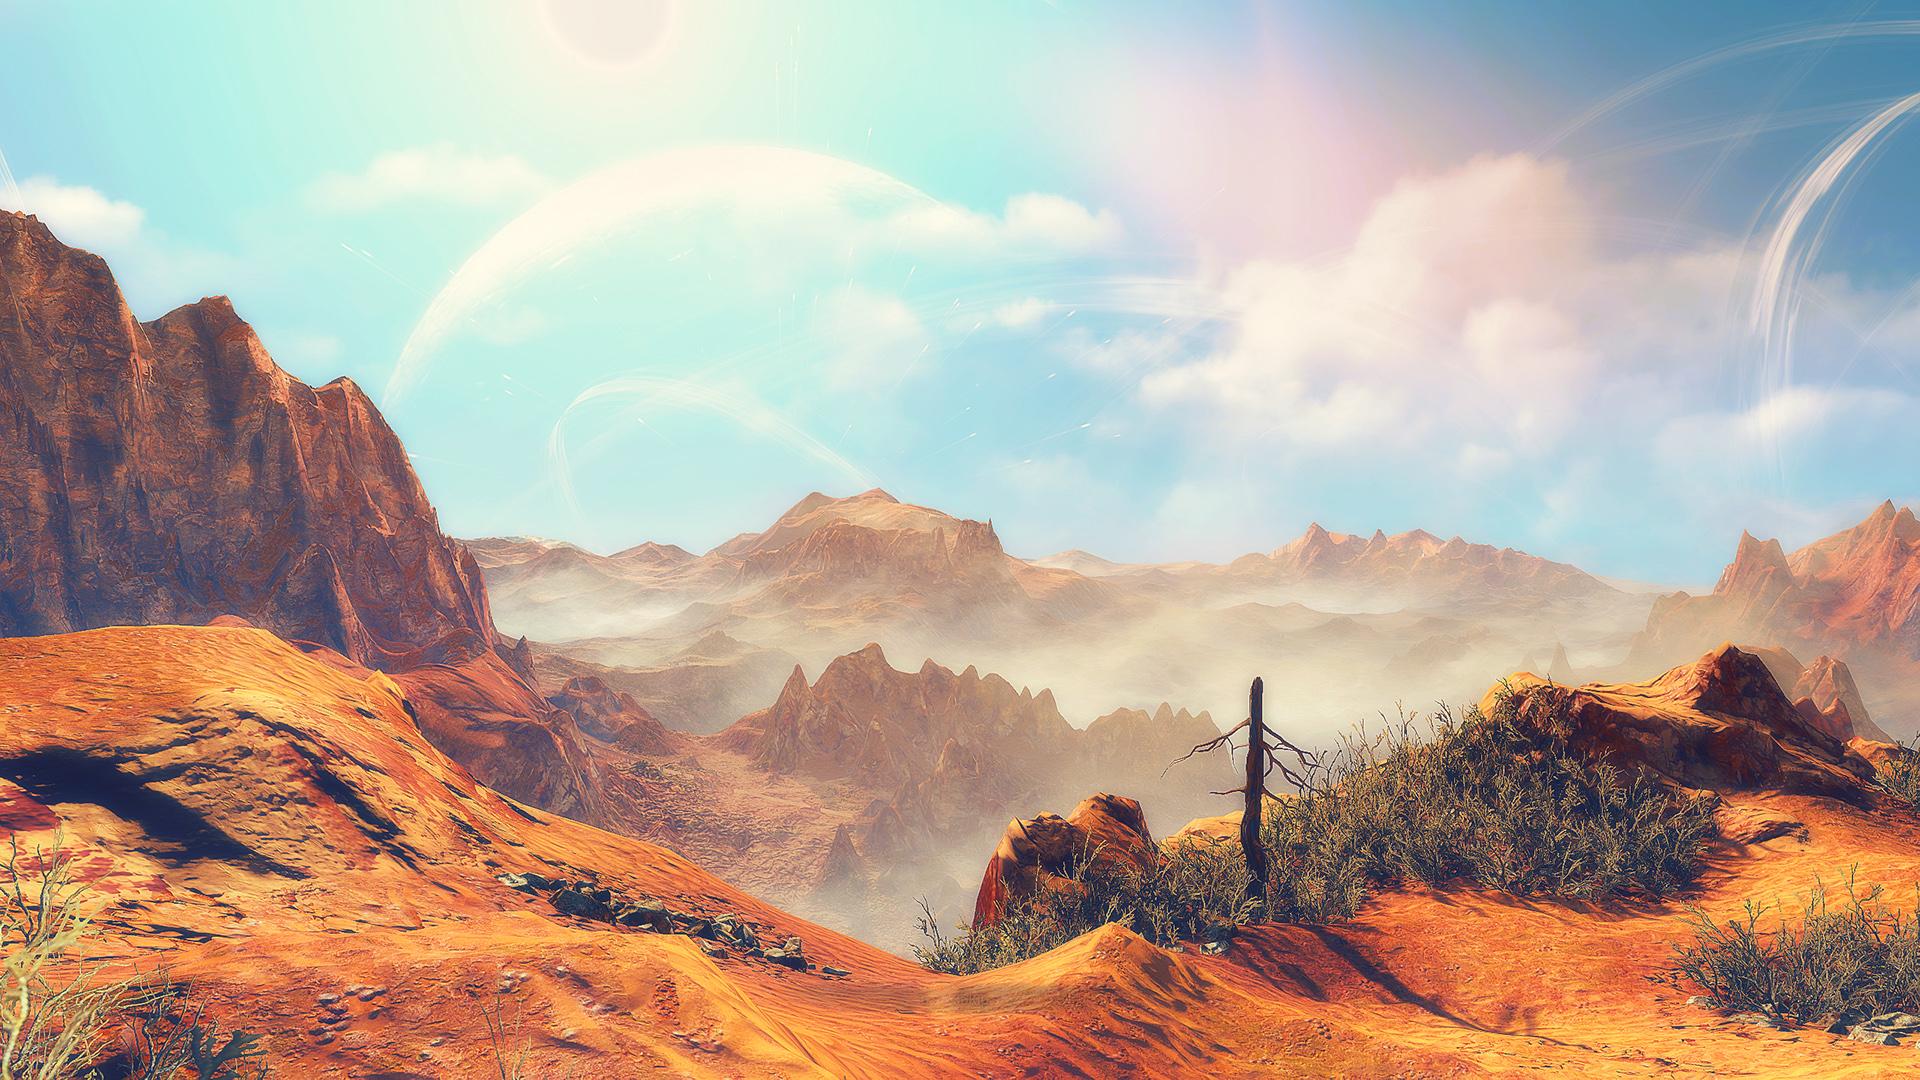 Ddiddiwedht Desert